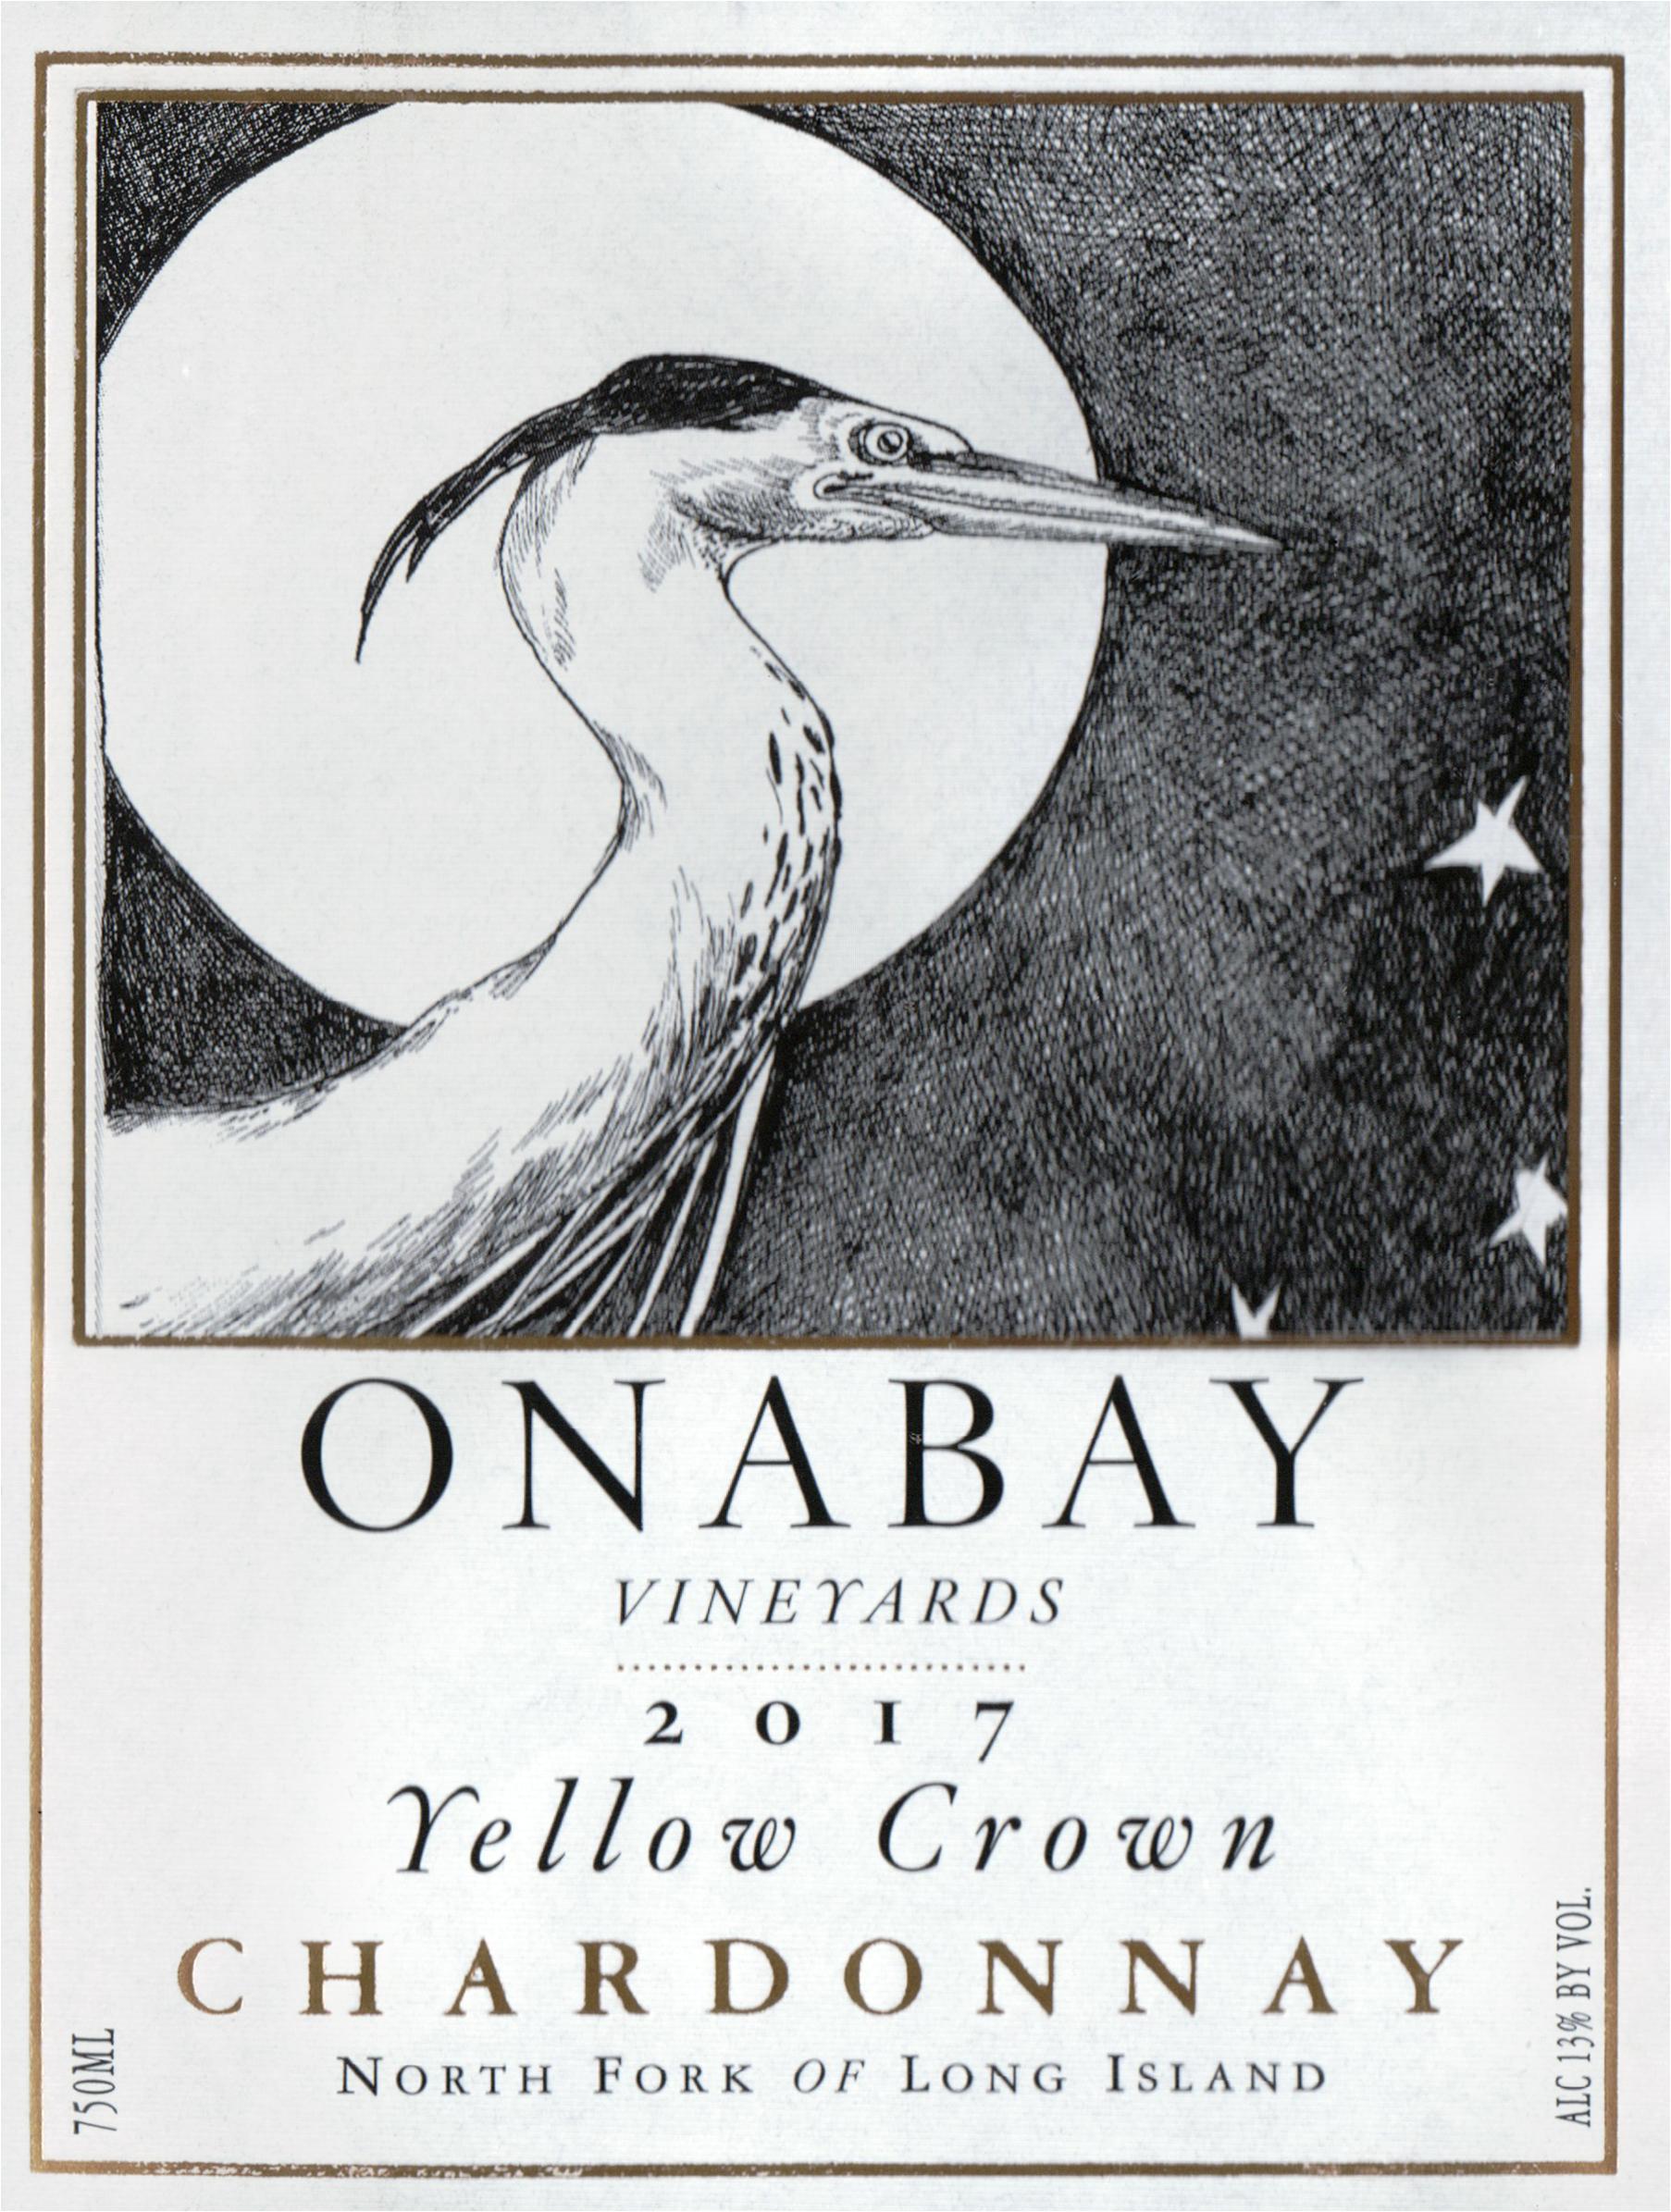 Onabay Chardonnay Yellow Crown 2017